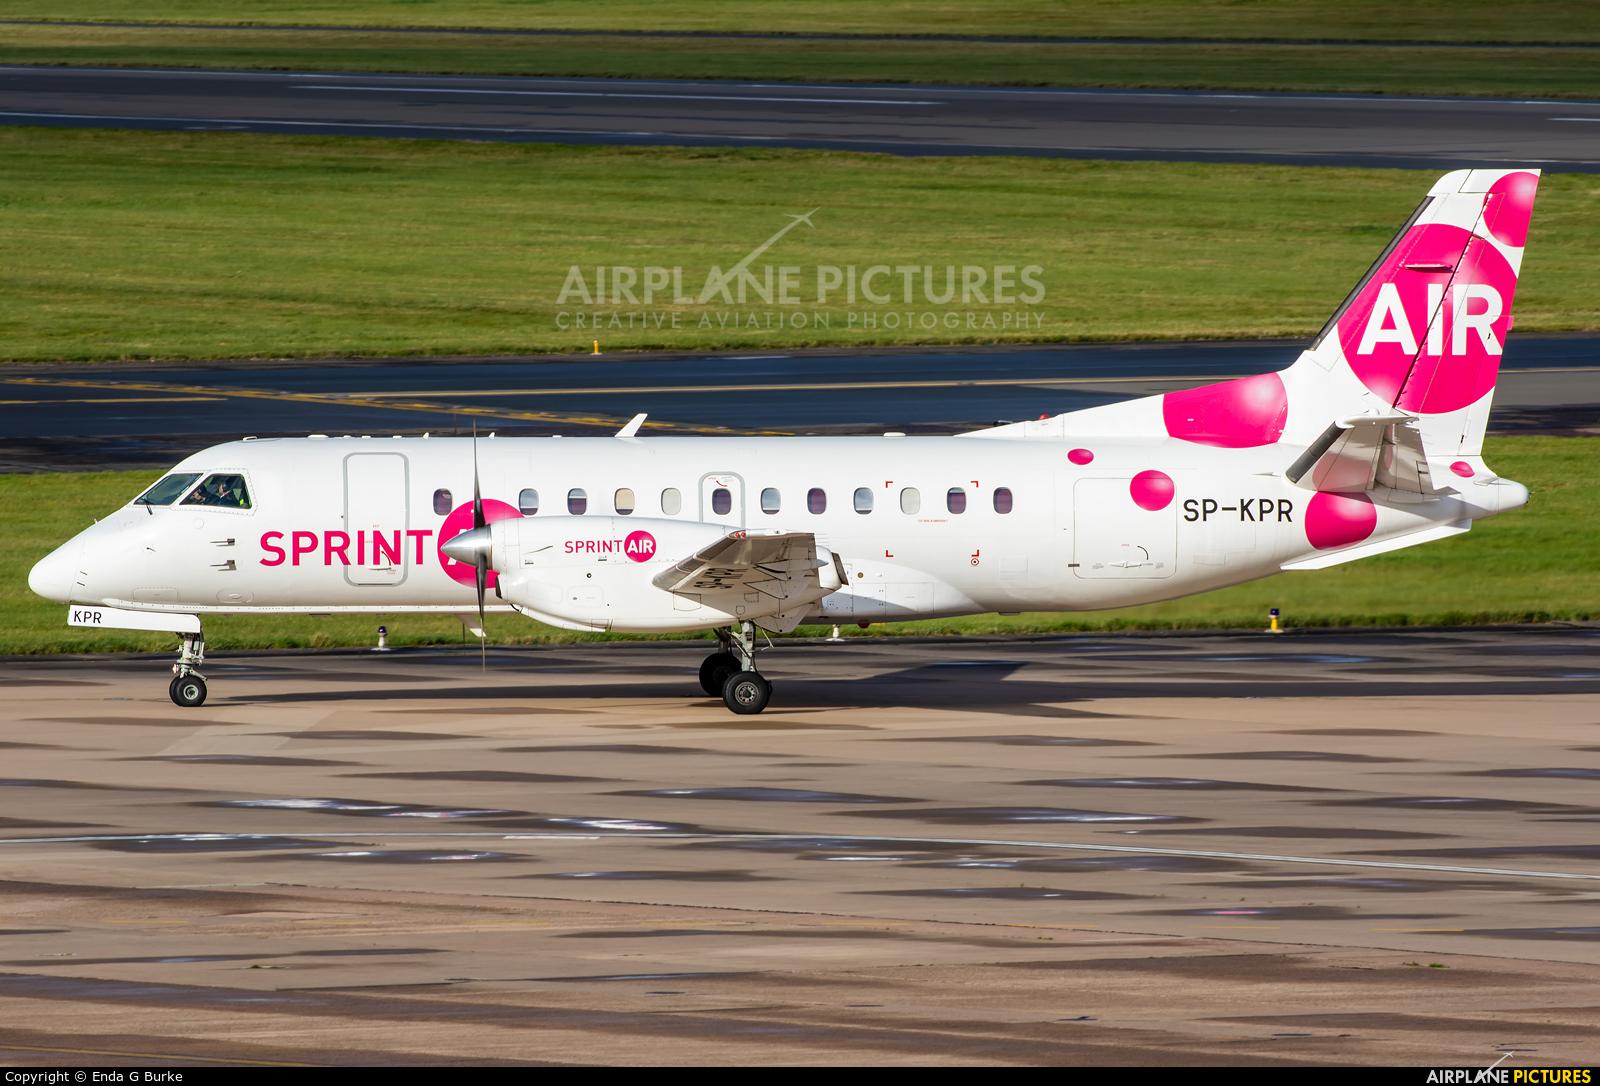 Sprint Air SP-KPR aircraft at Birmingham